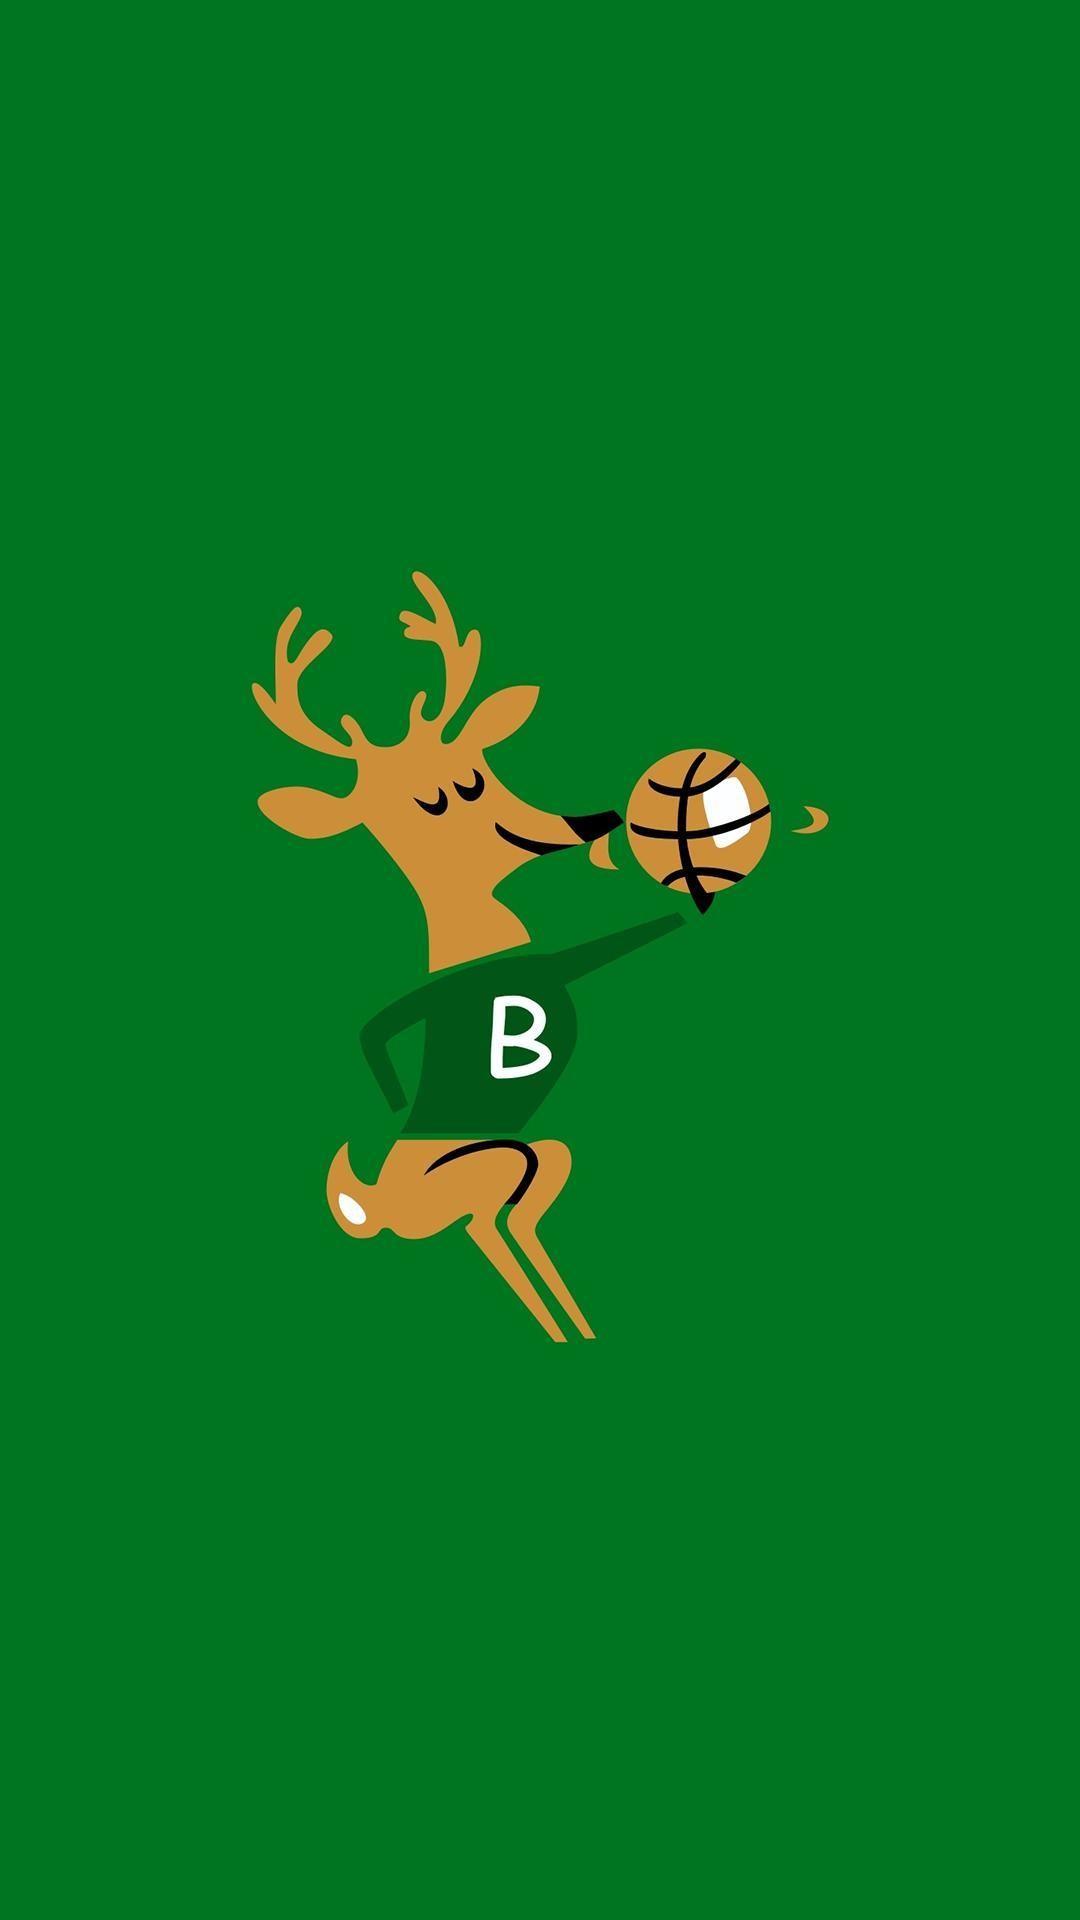 Milwaukee Bucks Wallpapers (74+ images)